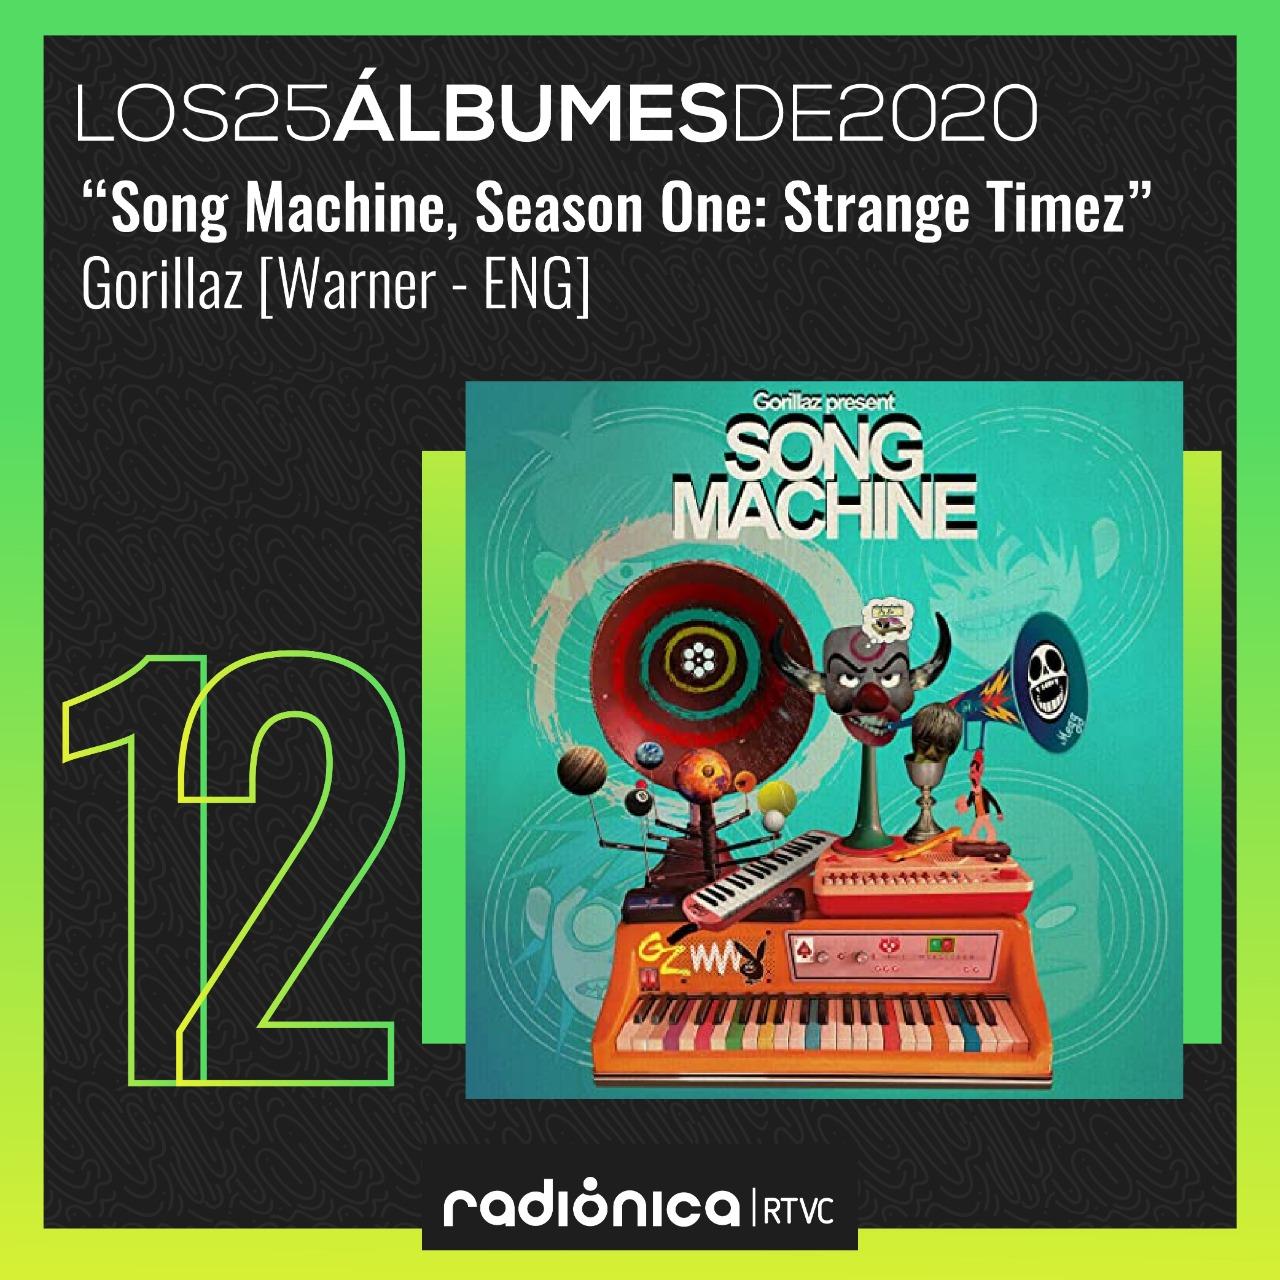 Gorillaz  Song Machine, Season One: Strange Timez